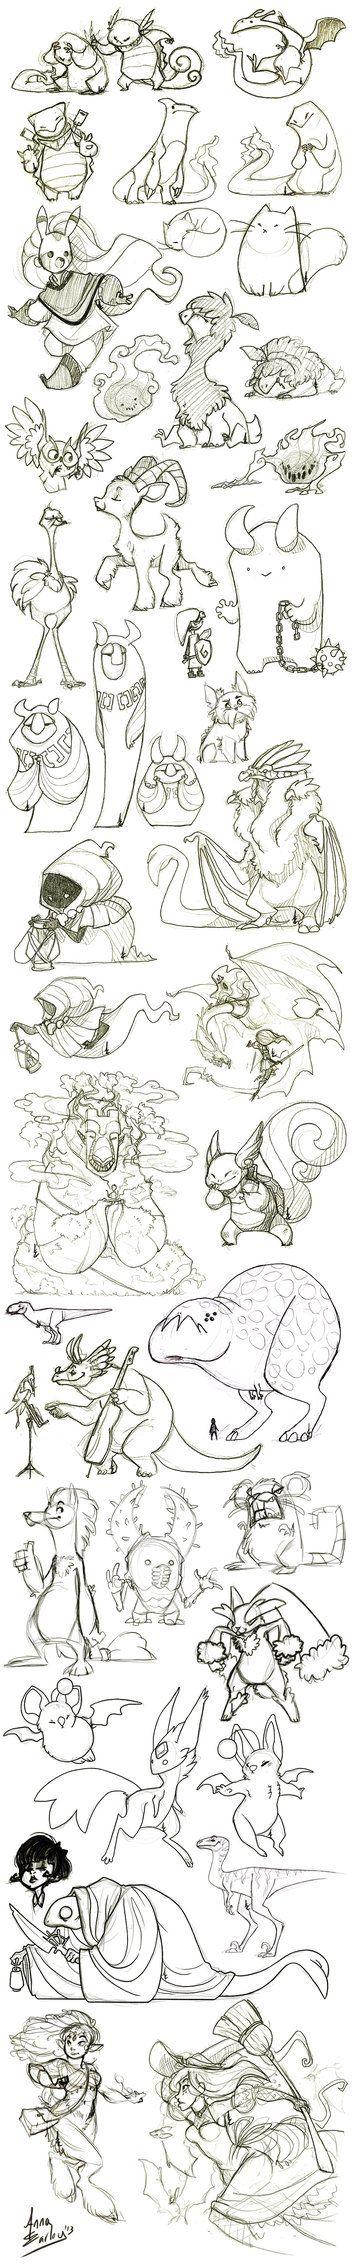 Great Big Sketchdump WInter '13 by Turtle-Arts on deviantART